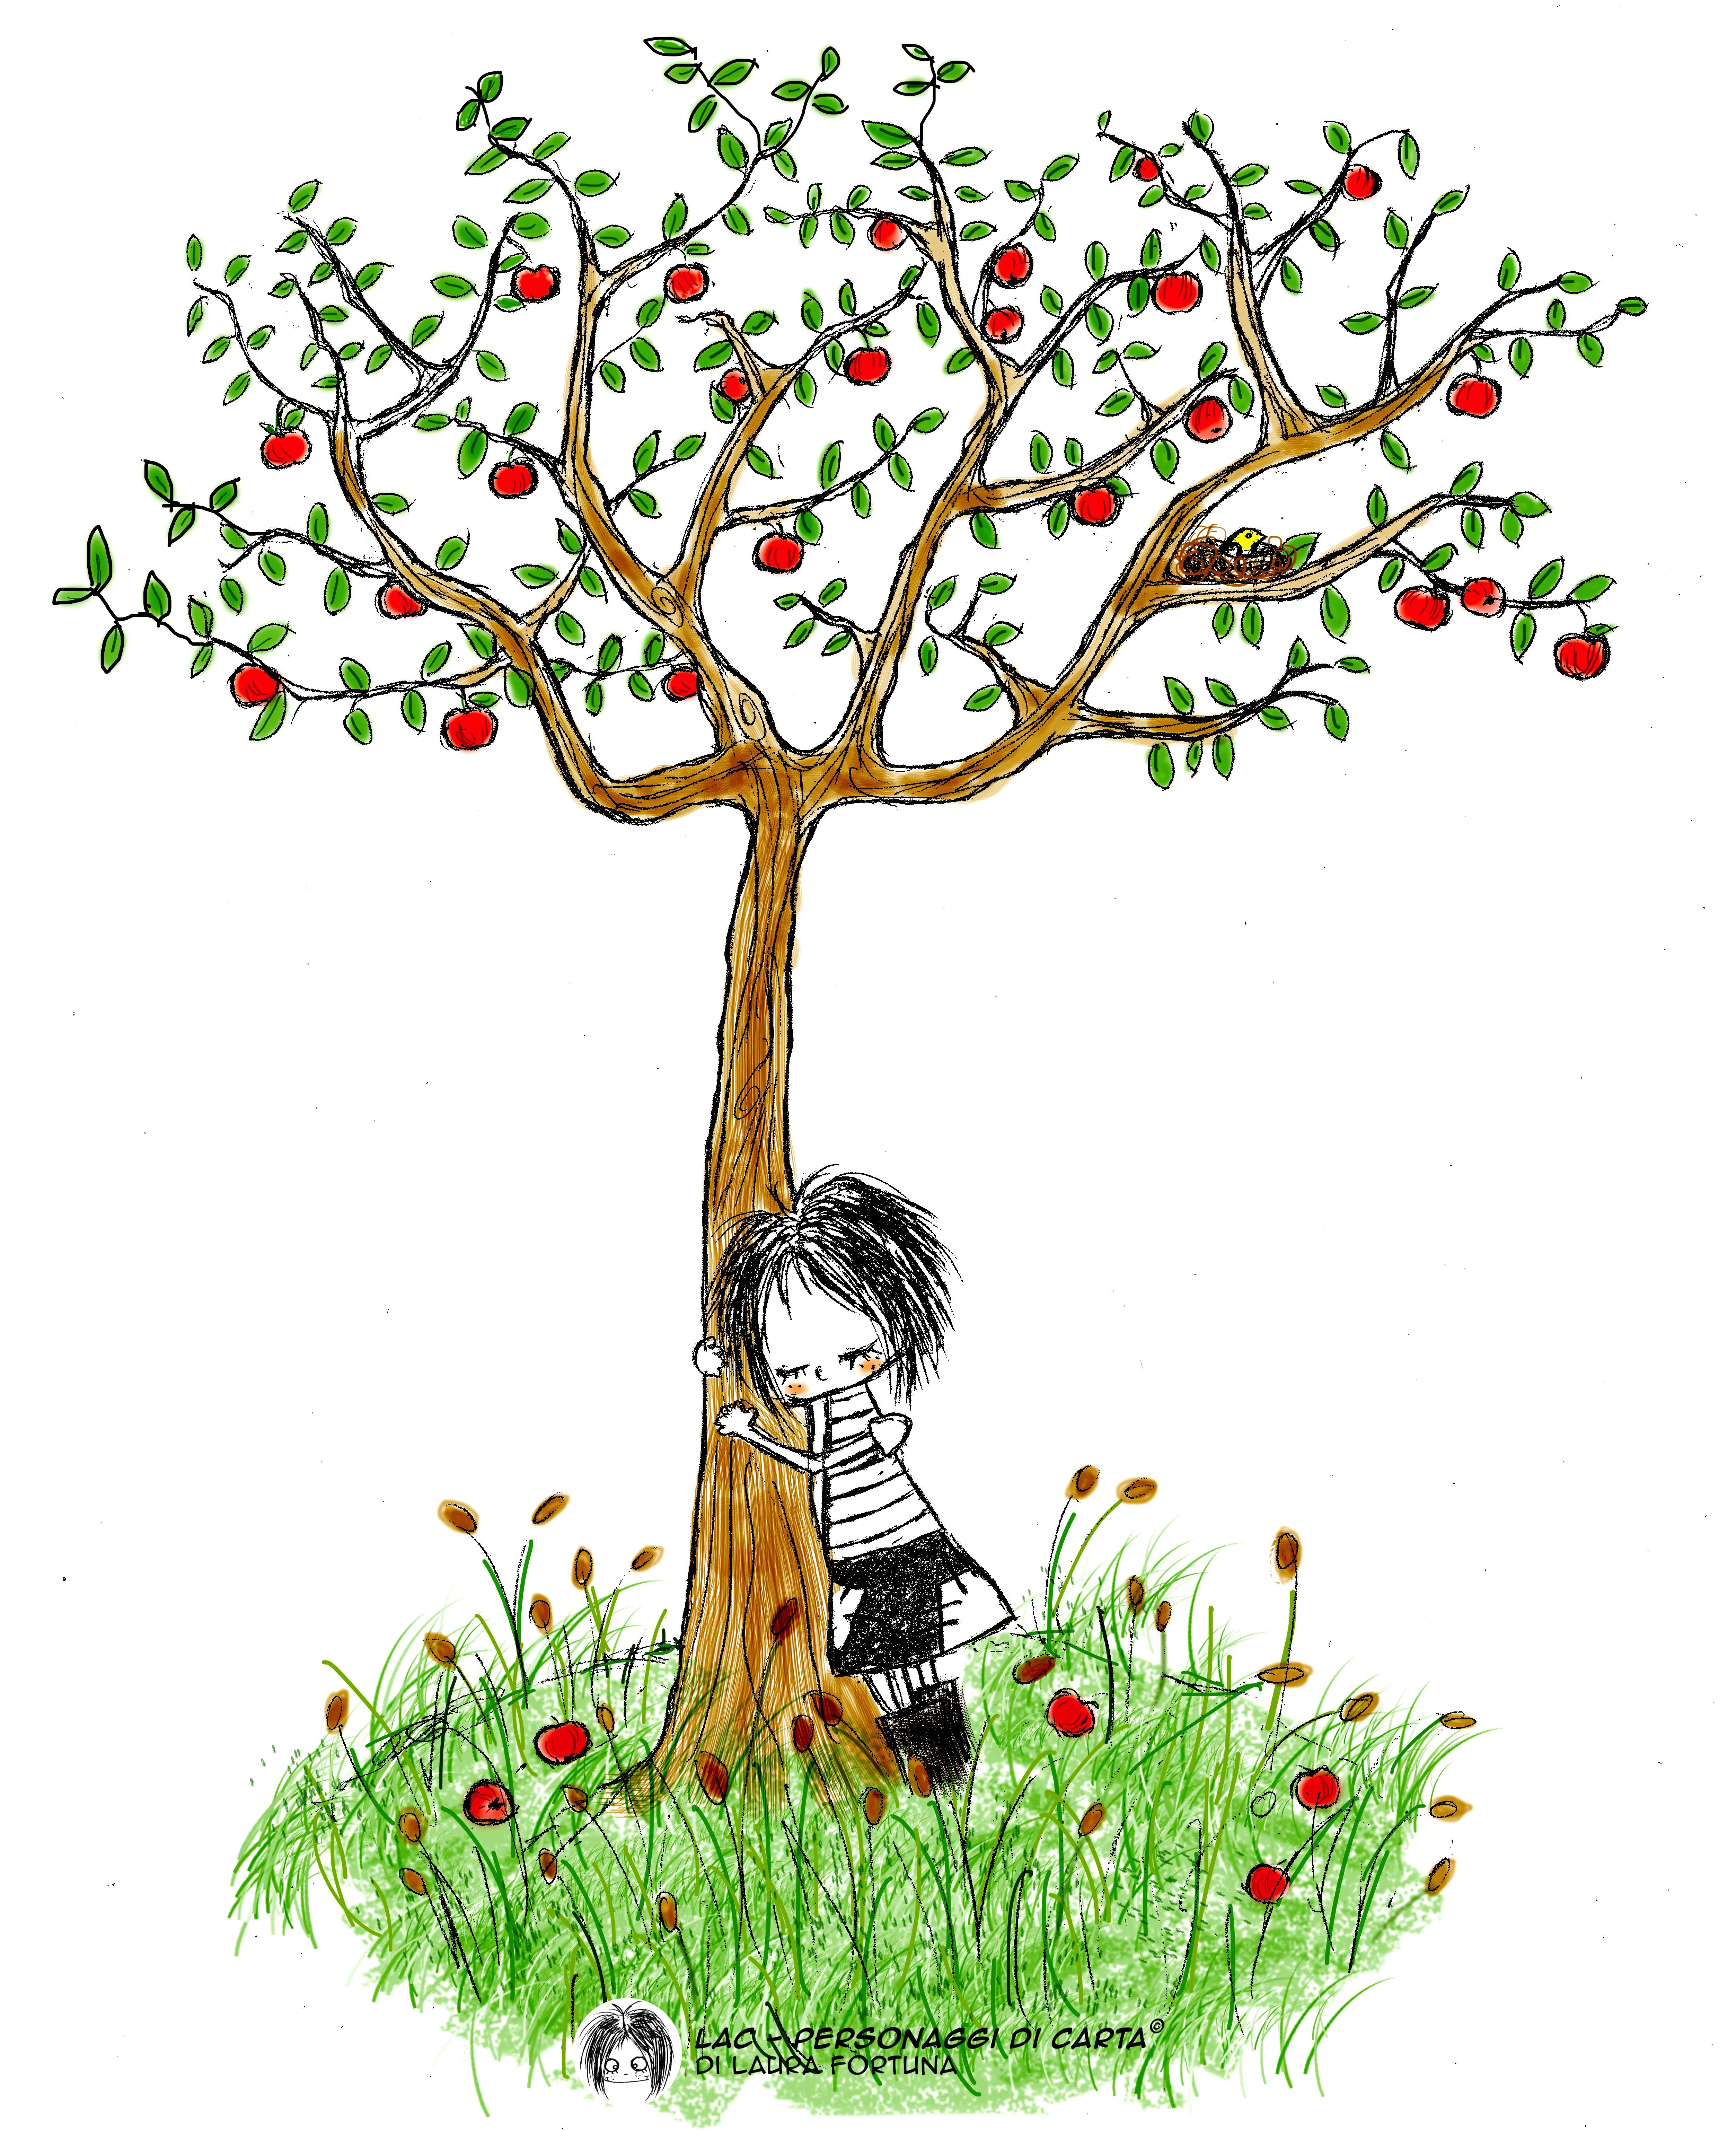 L'albero, Luis Sepulveda